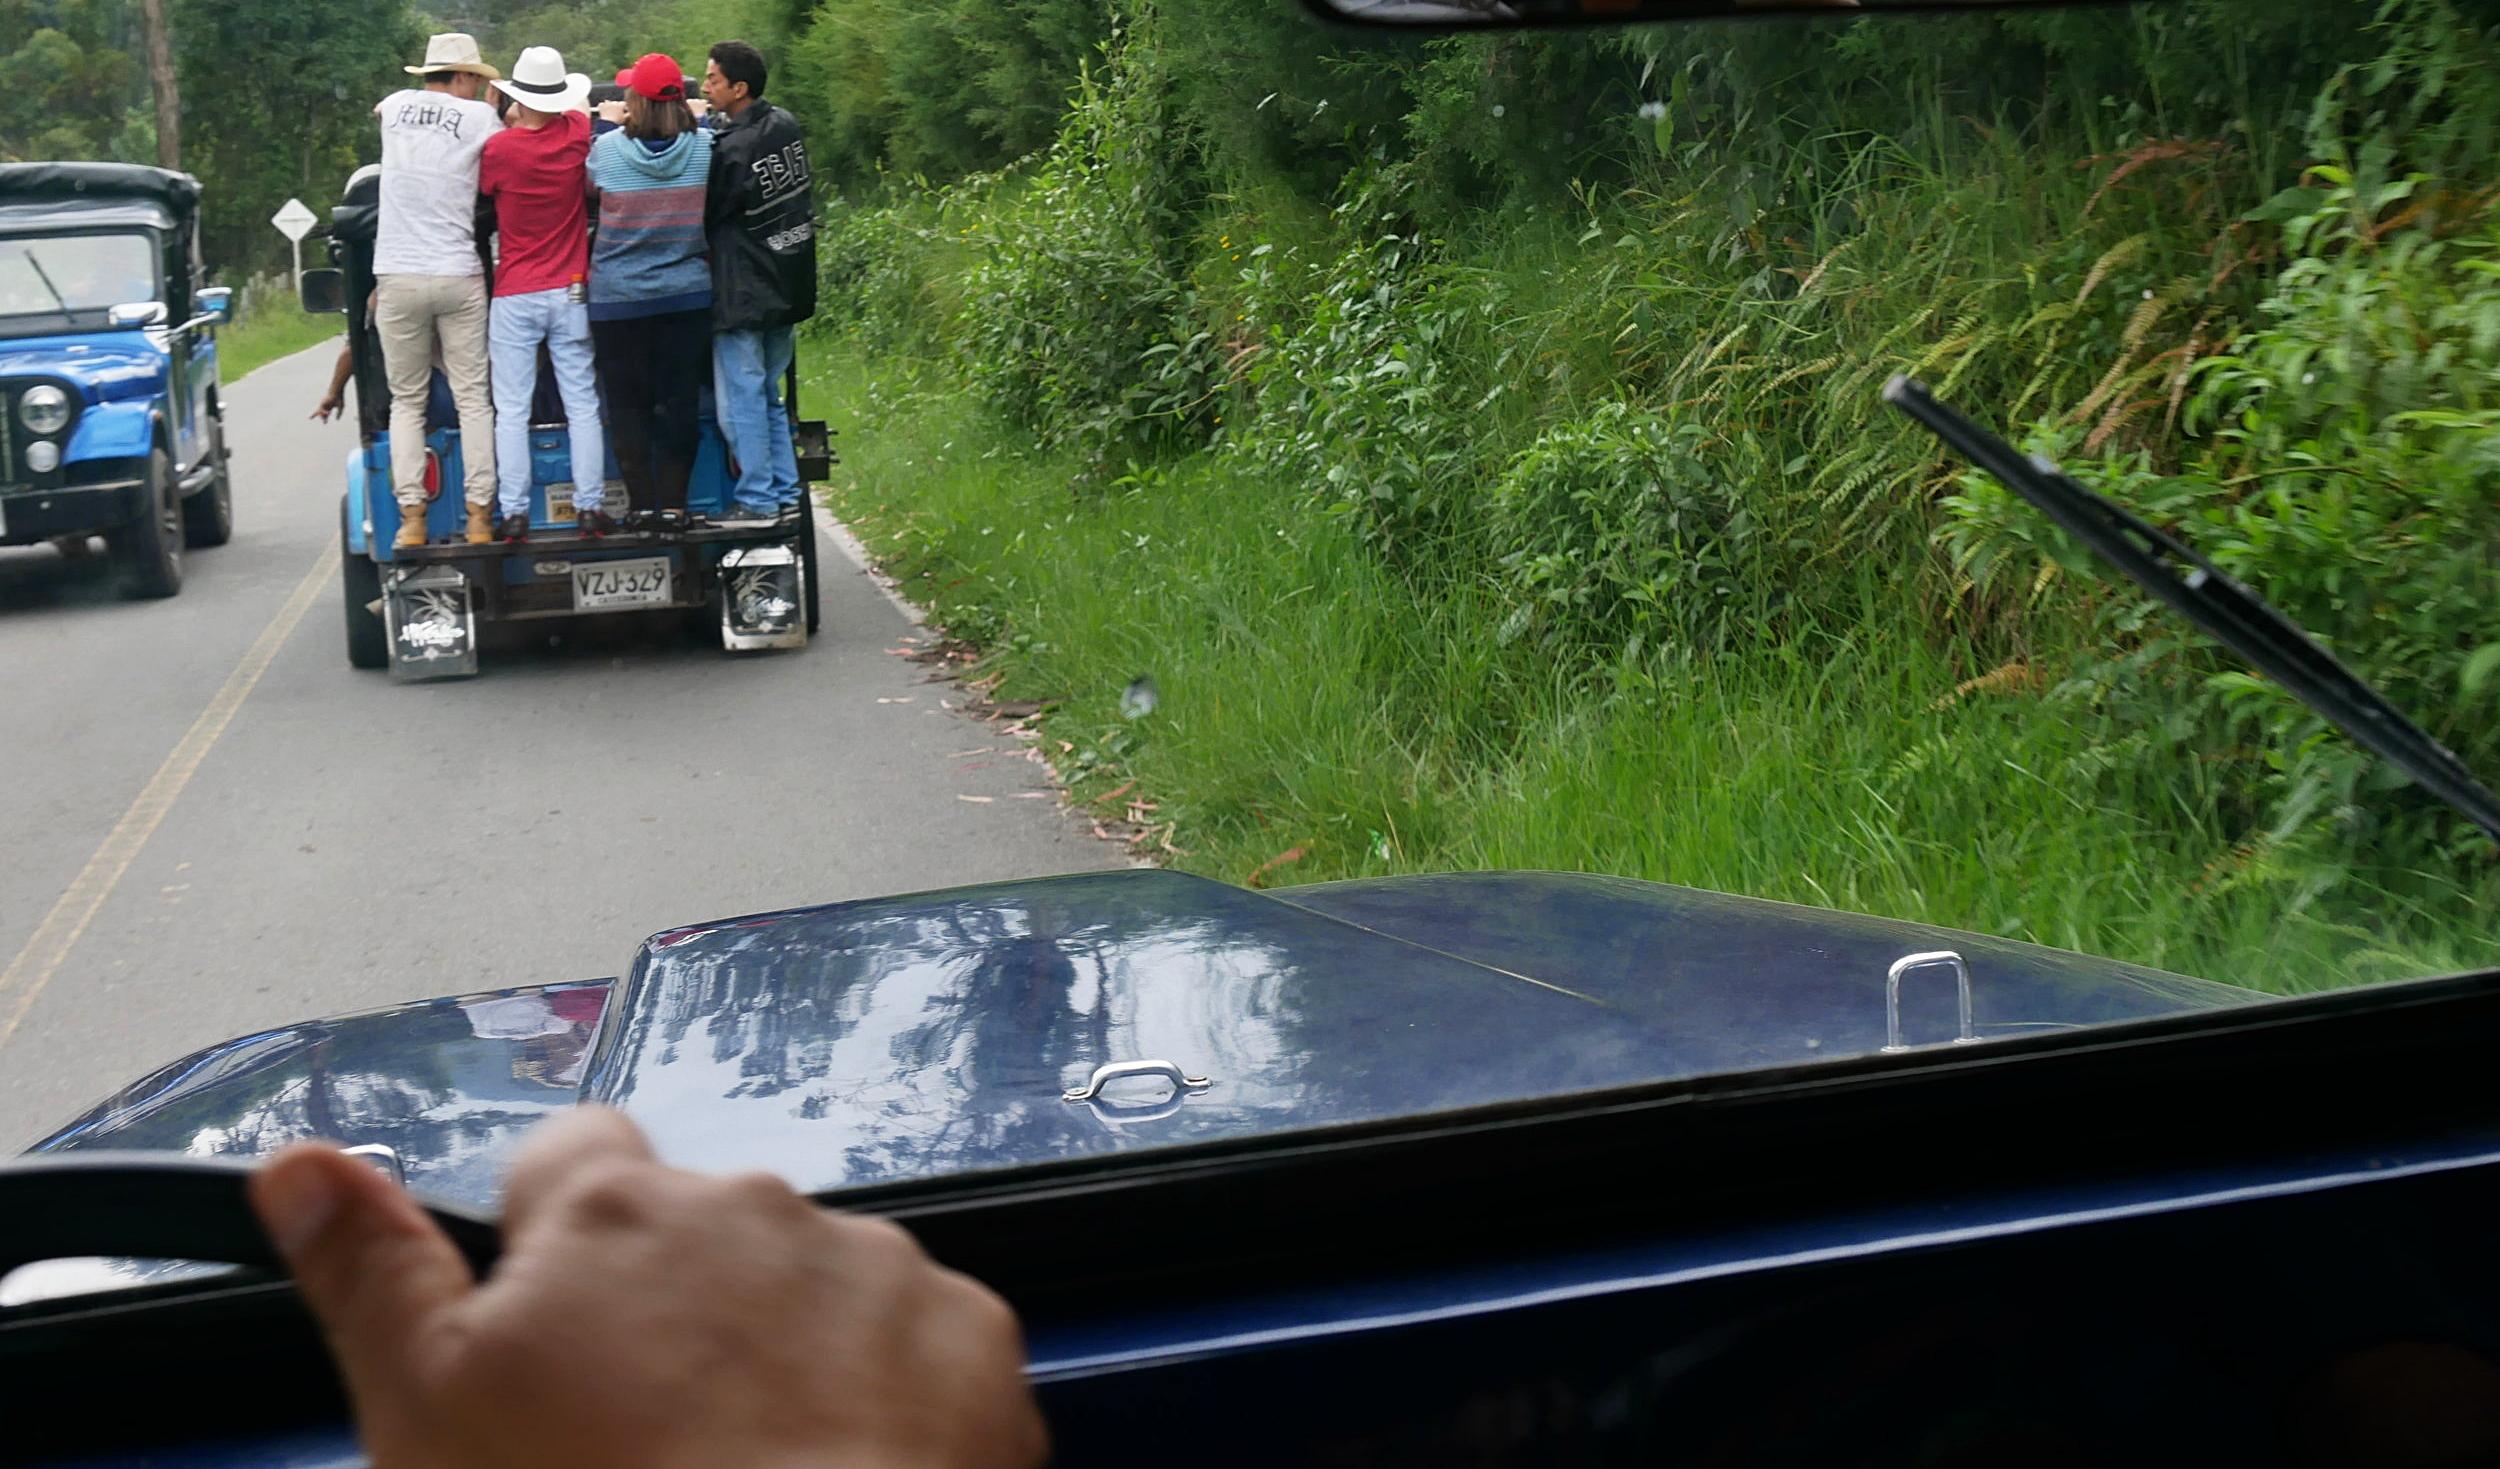 Willy traffic jam